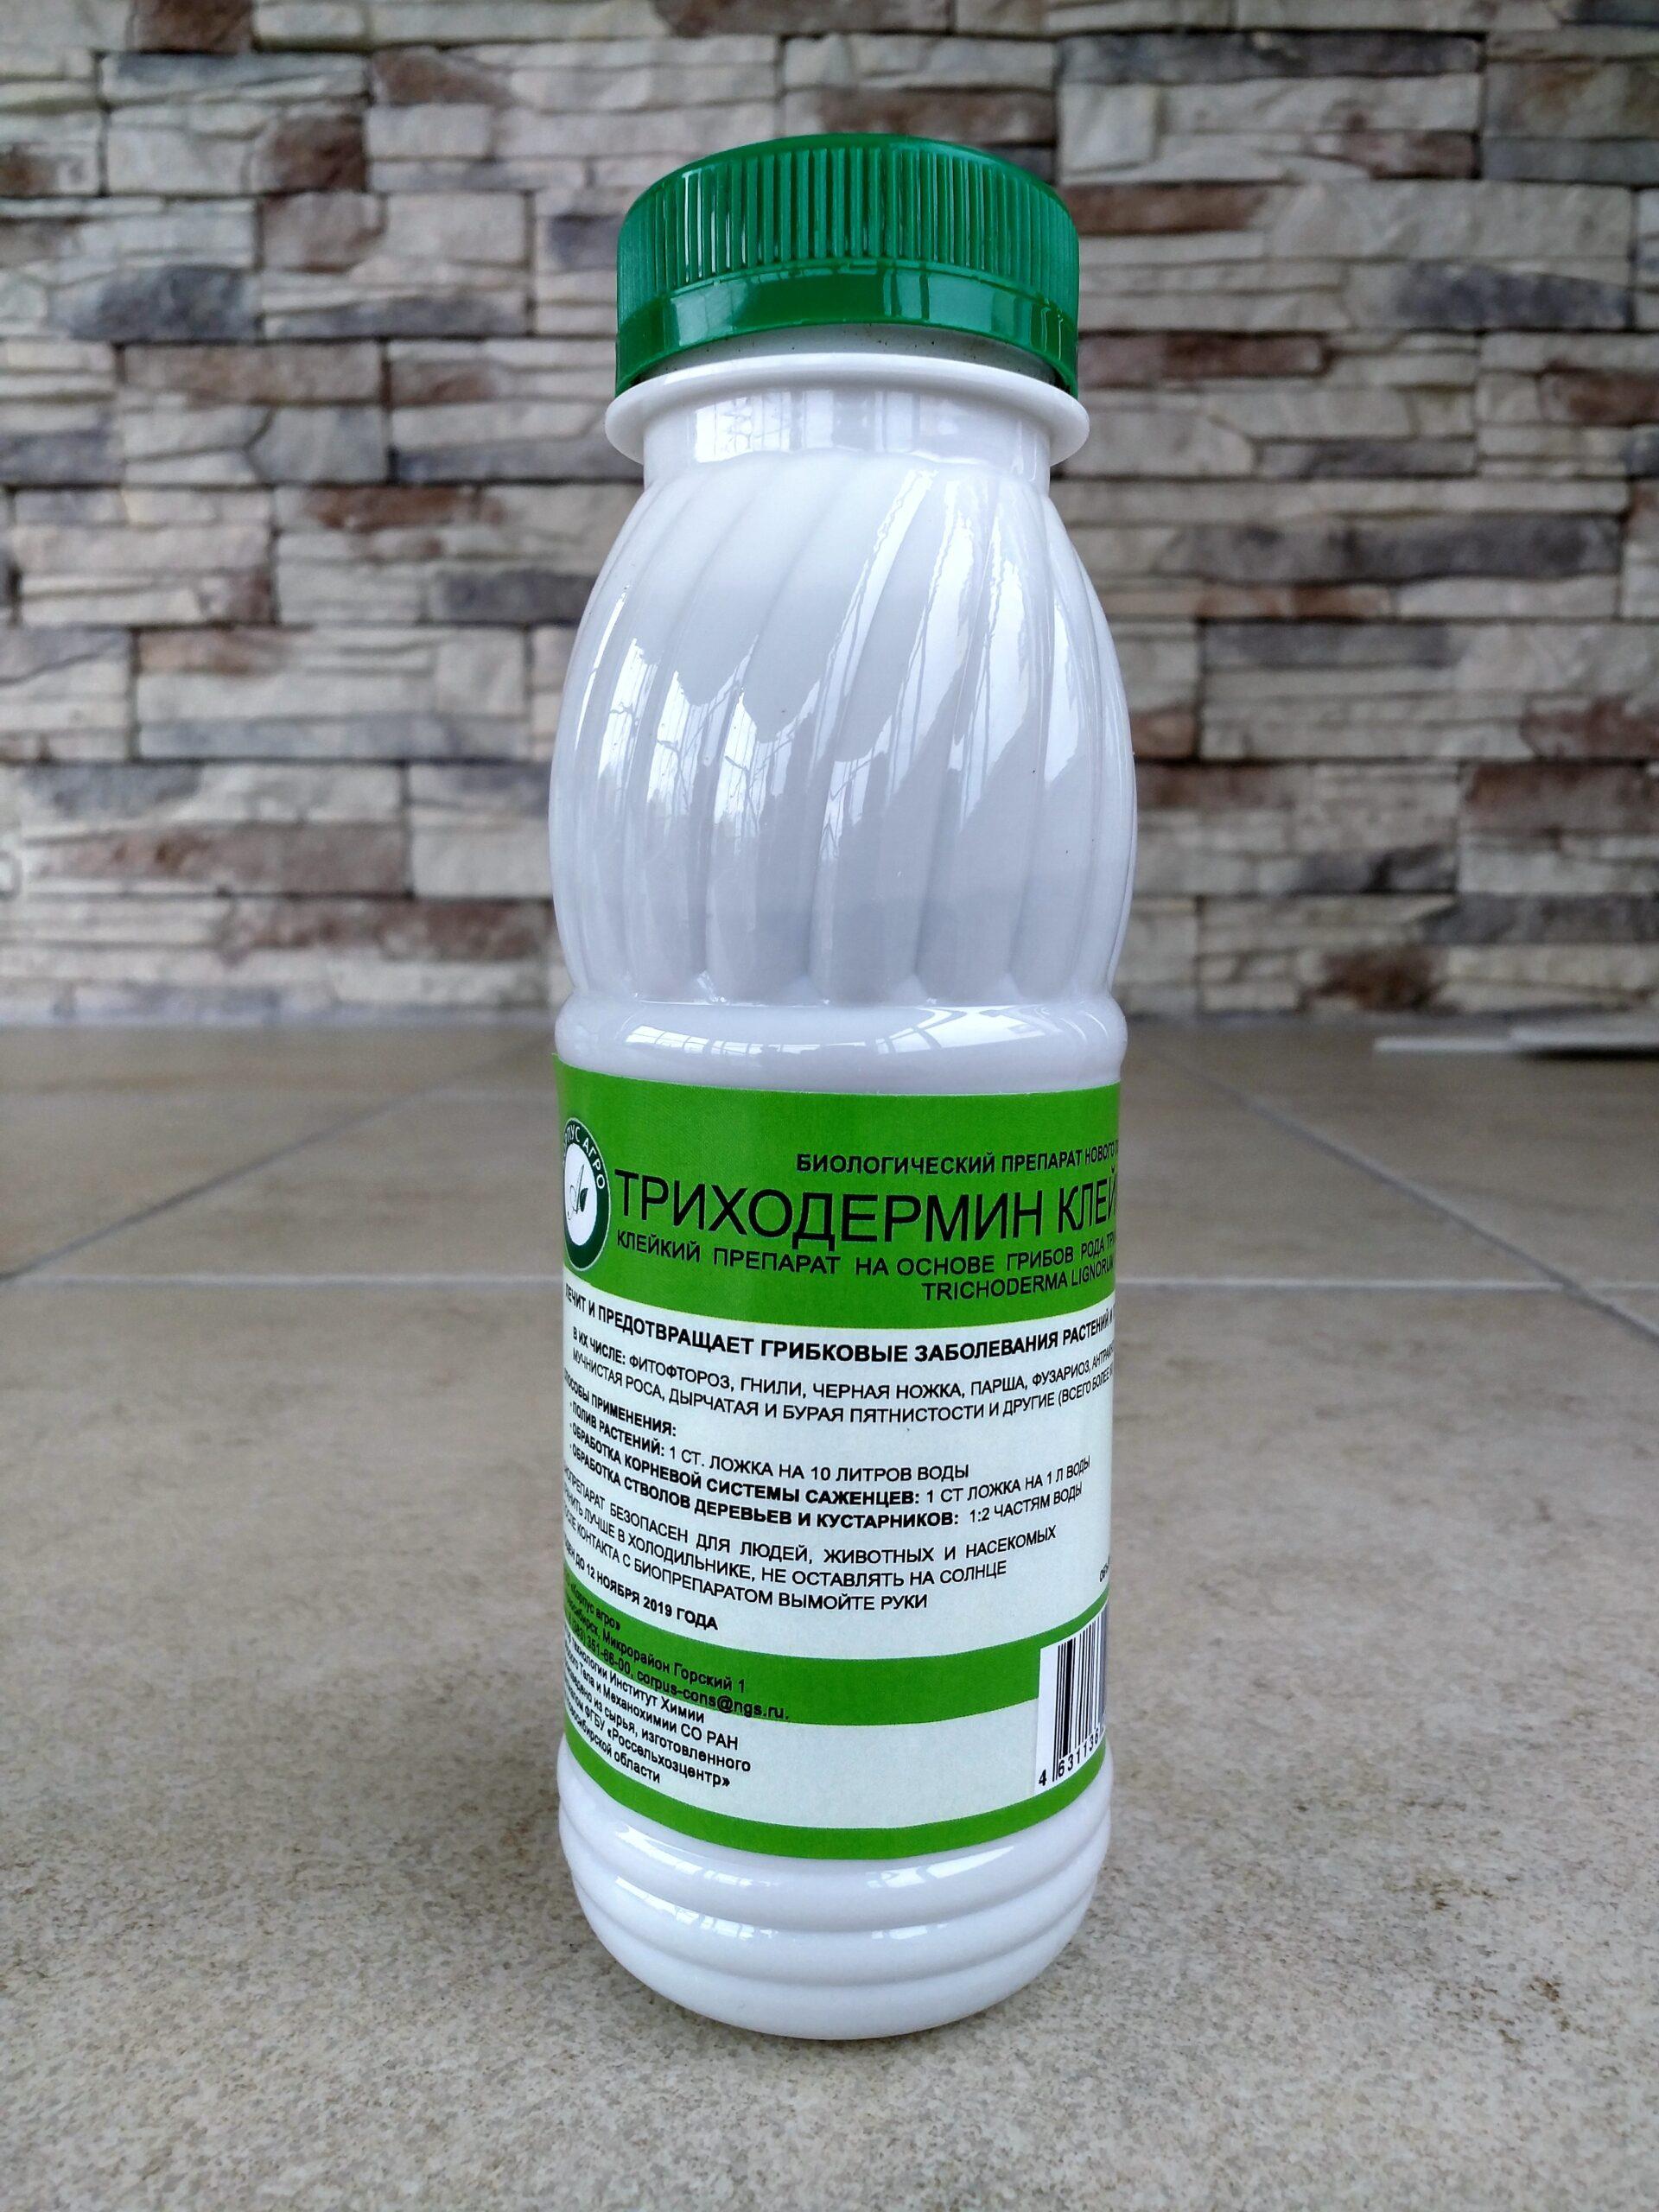 Триходермин 1 литр Image